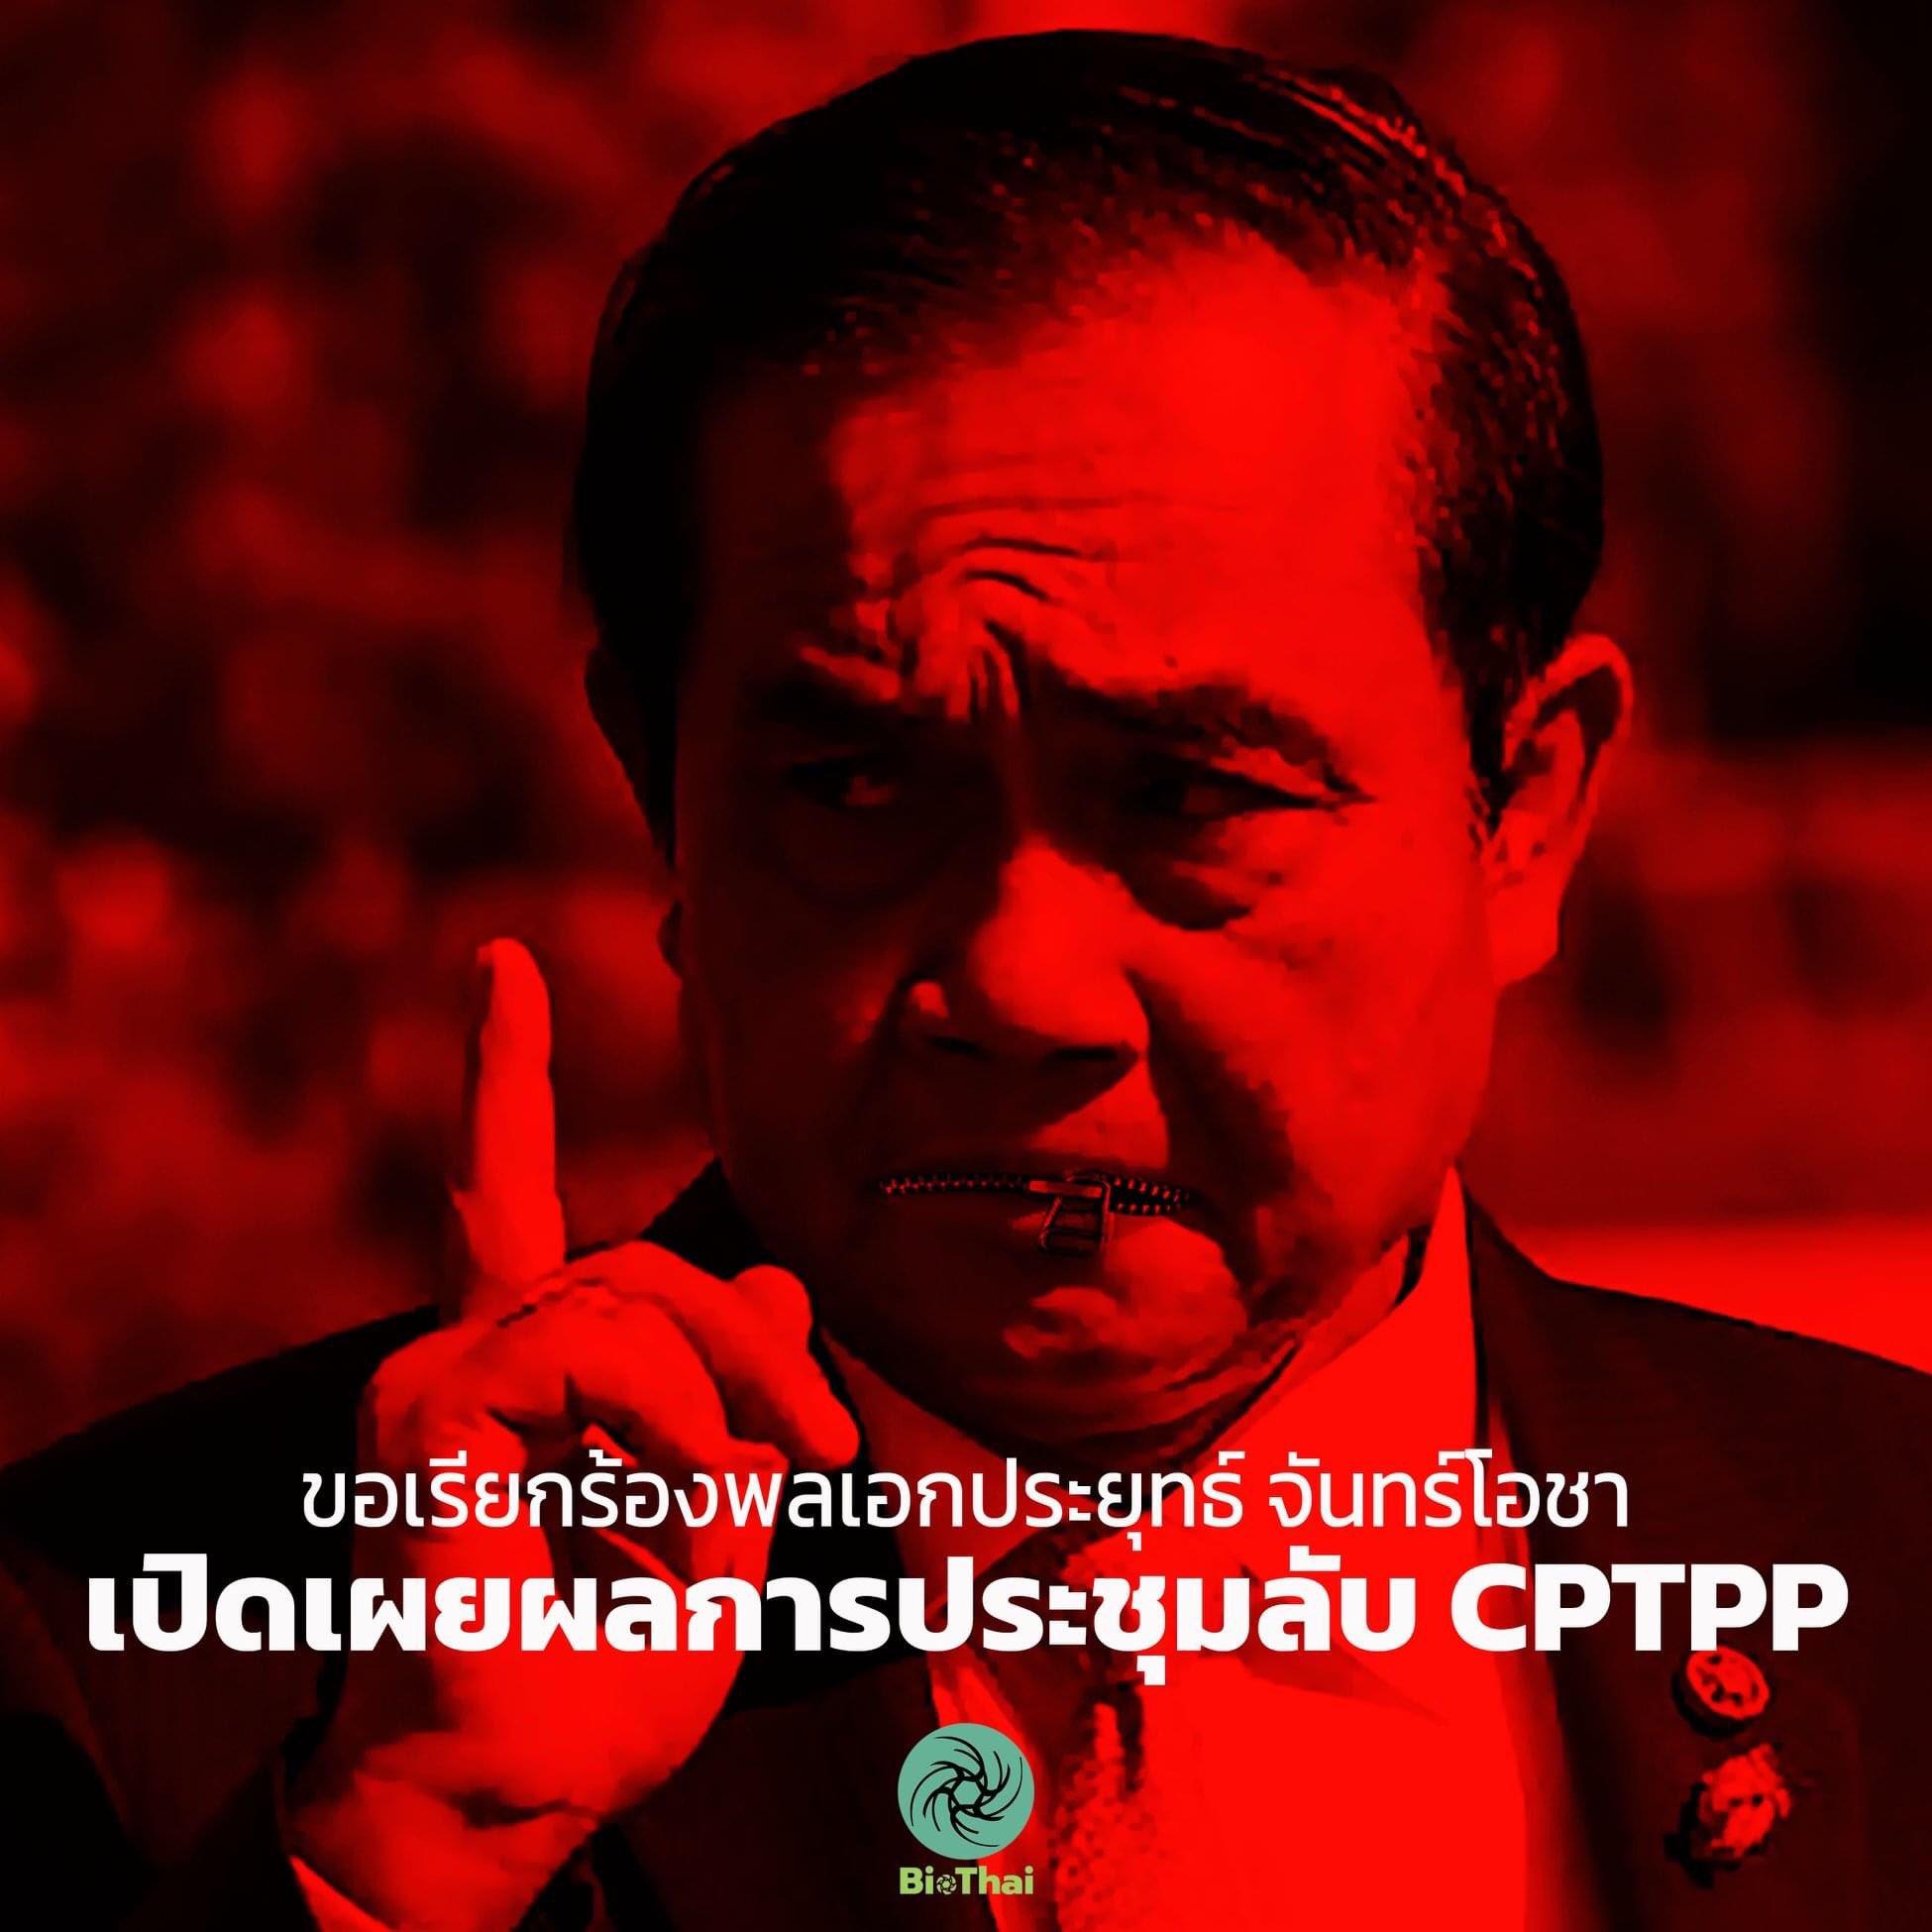 #NoCPTPP Photo,#NoCPTPP Twitter Trend : Most Popular Tweets